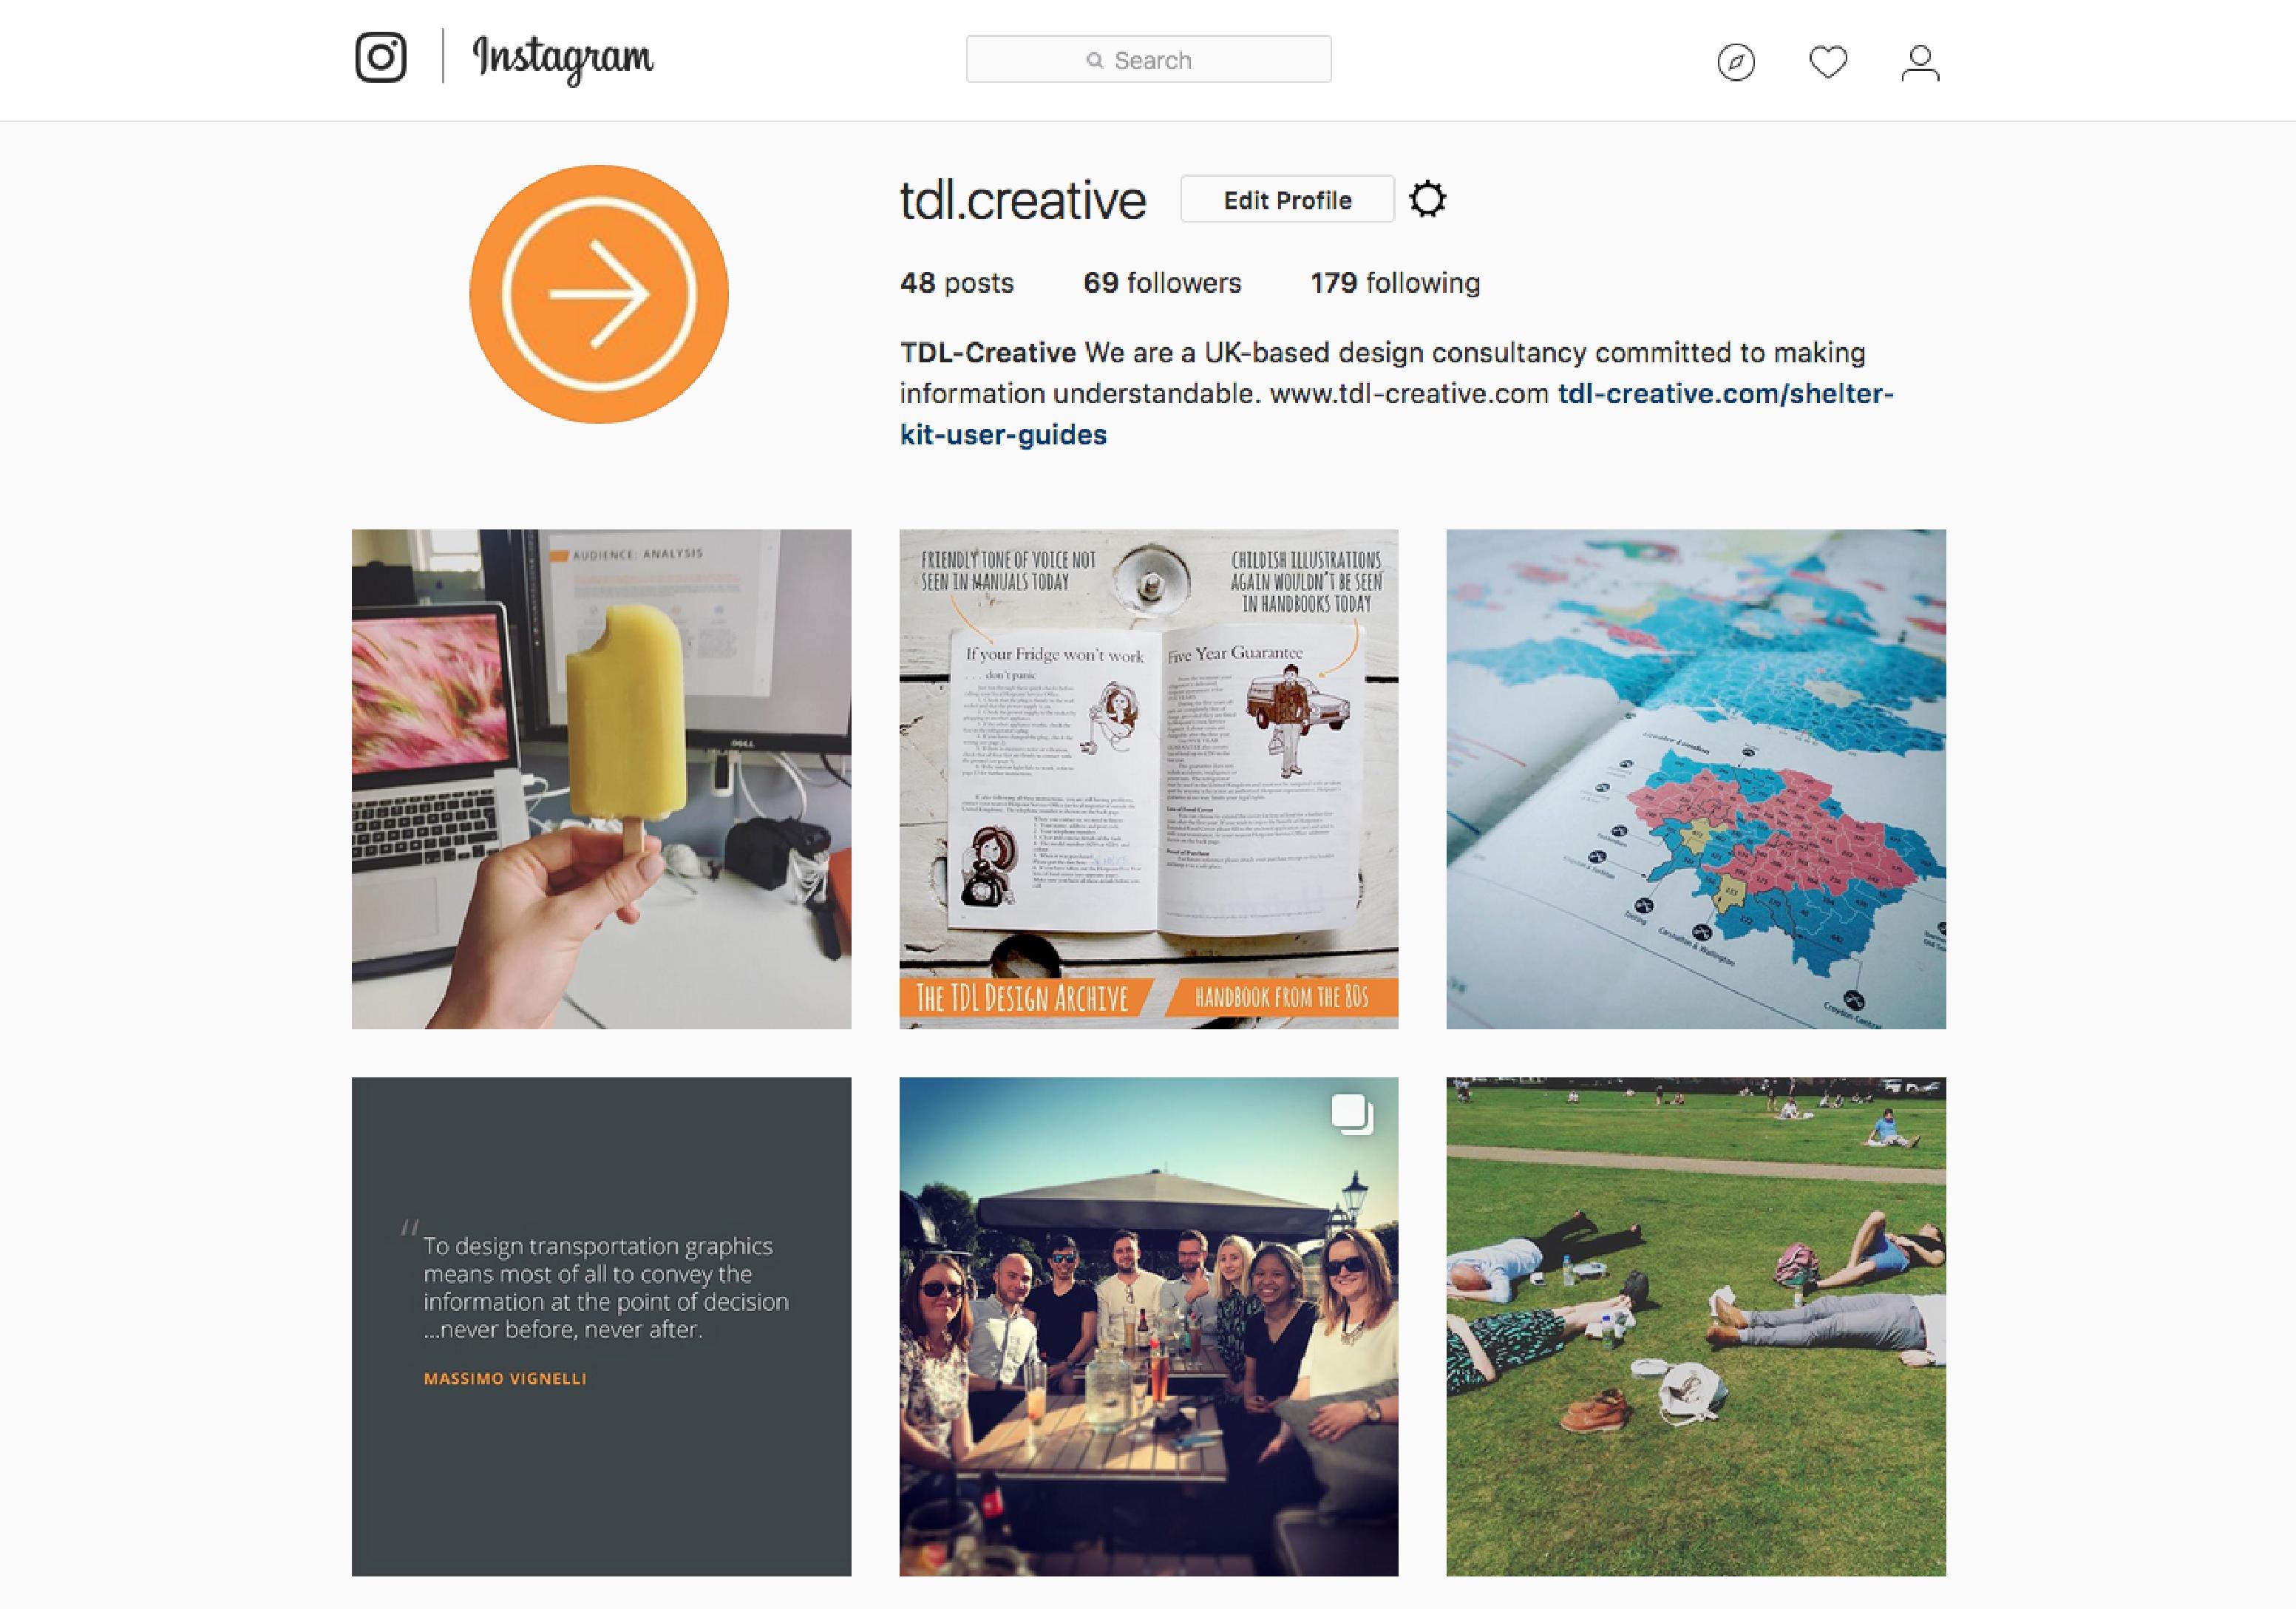 TDL-Creative Instagram